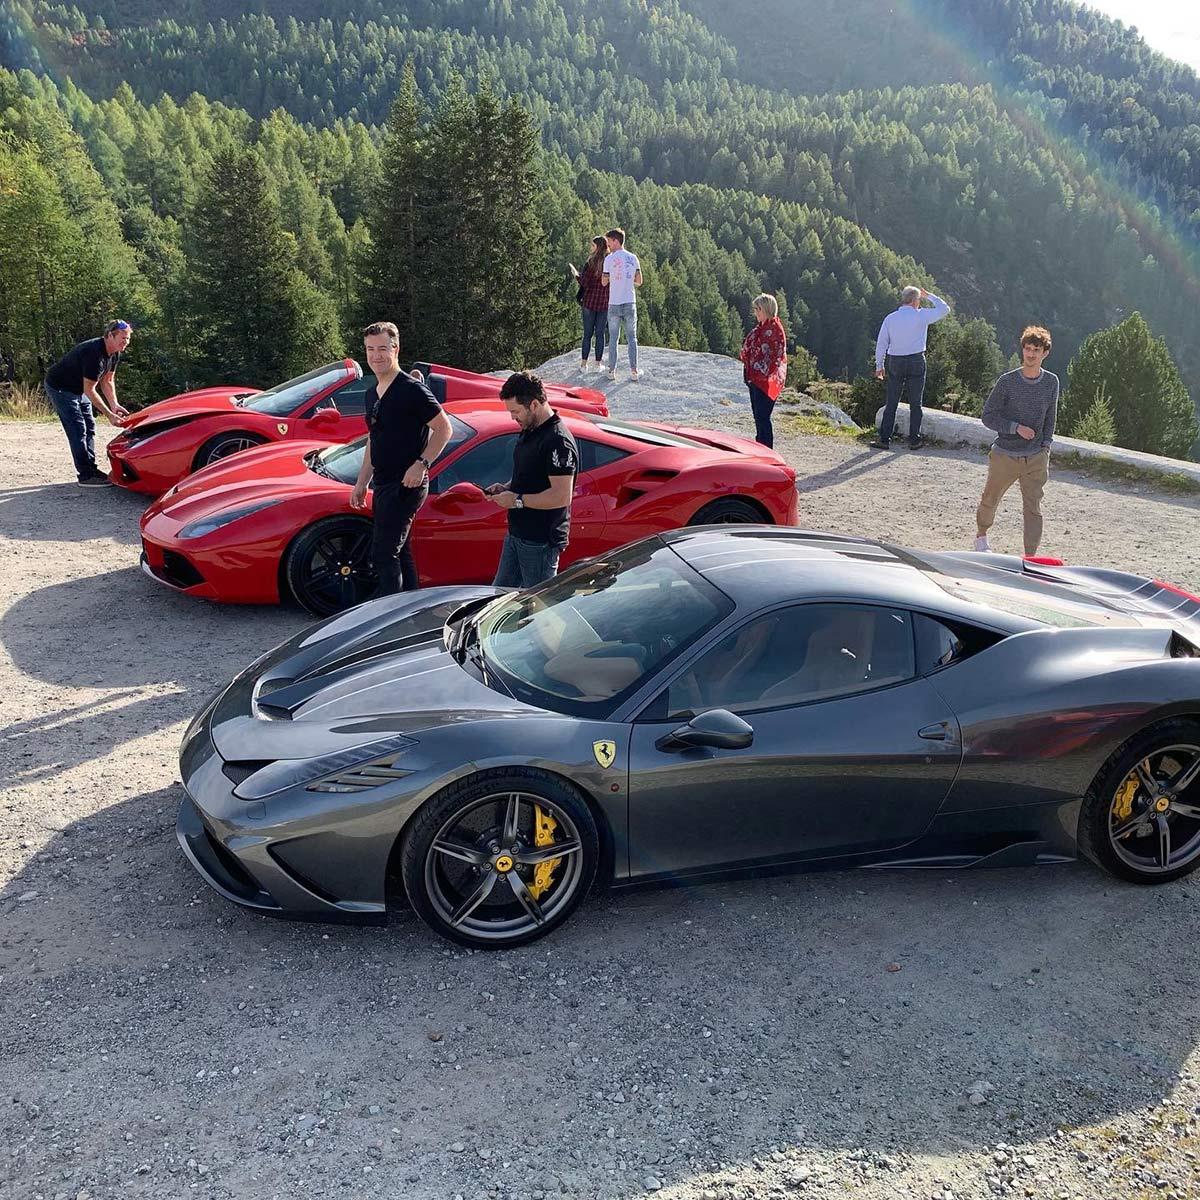 Ferrari birthday tour in Europe